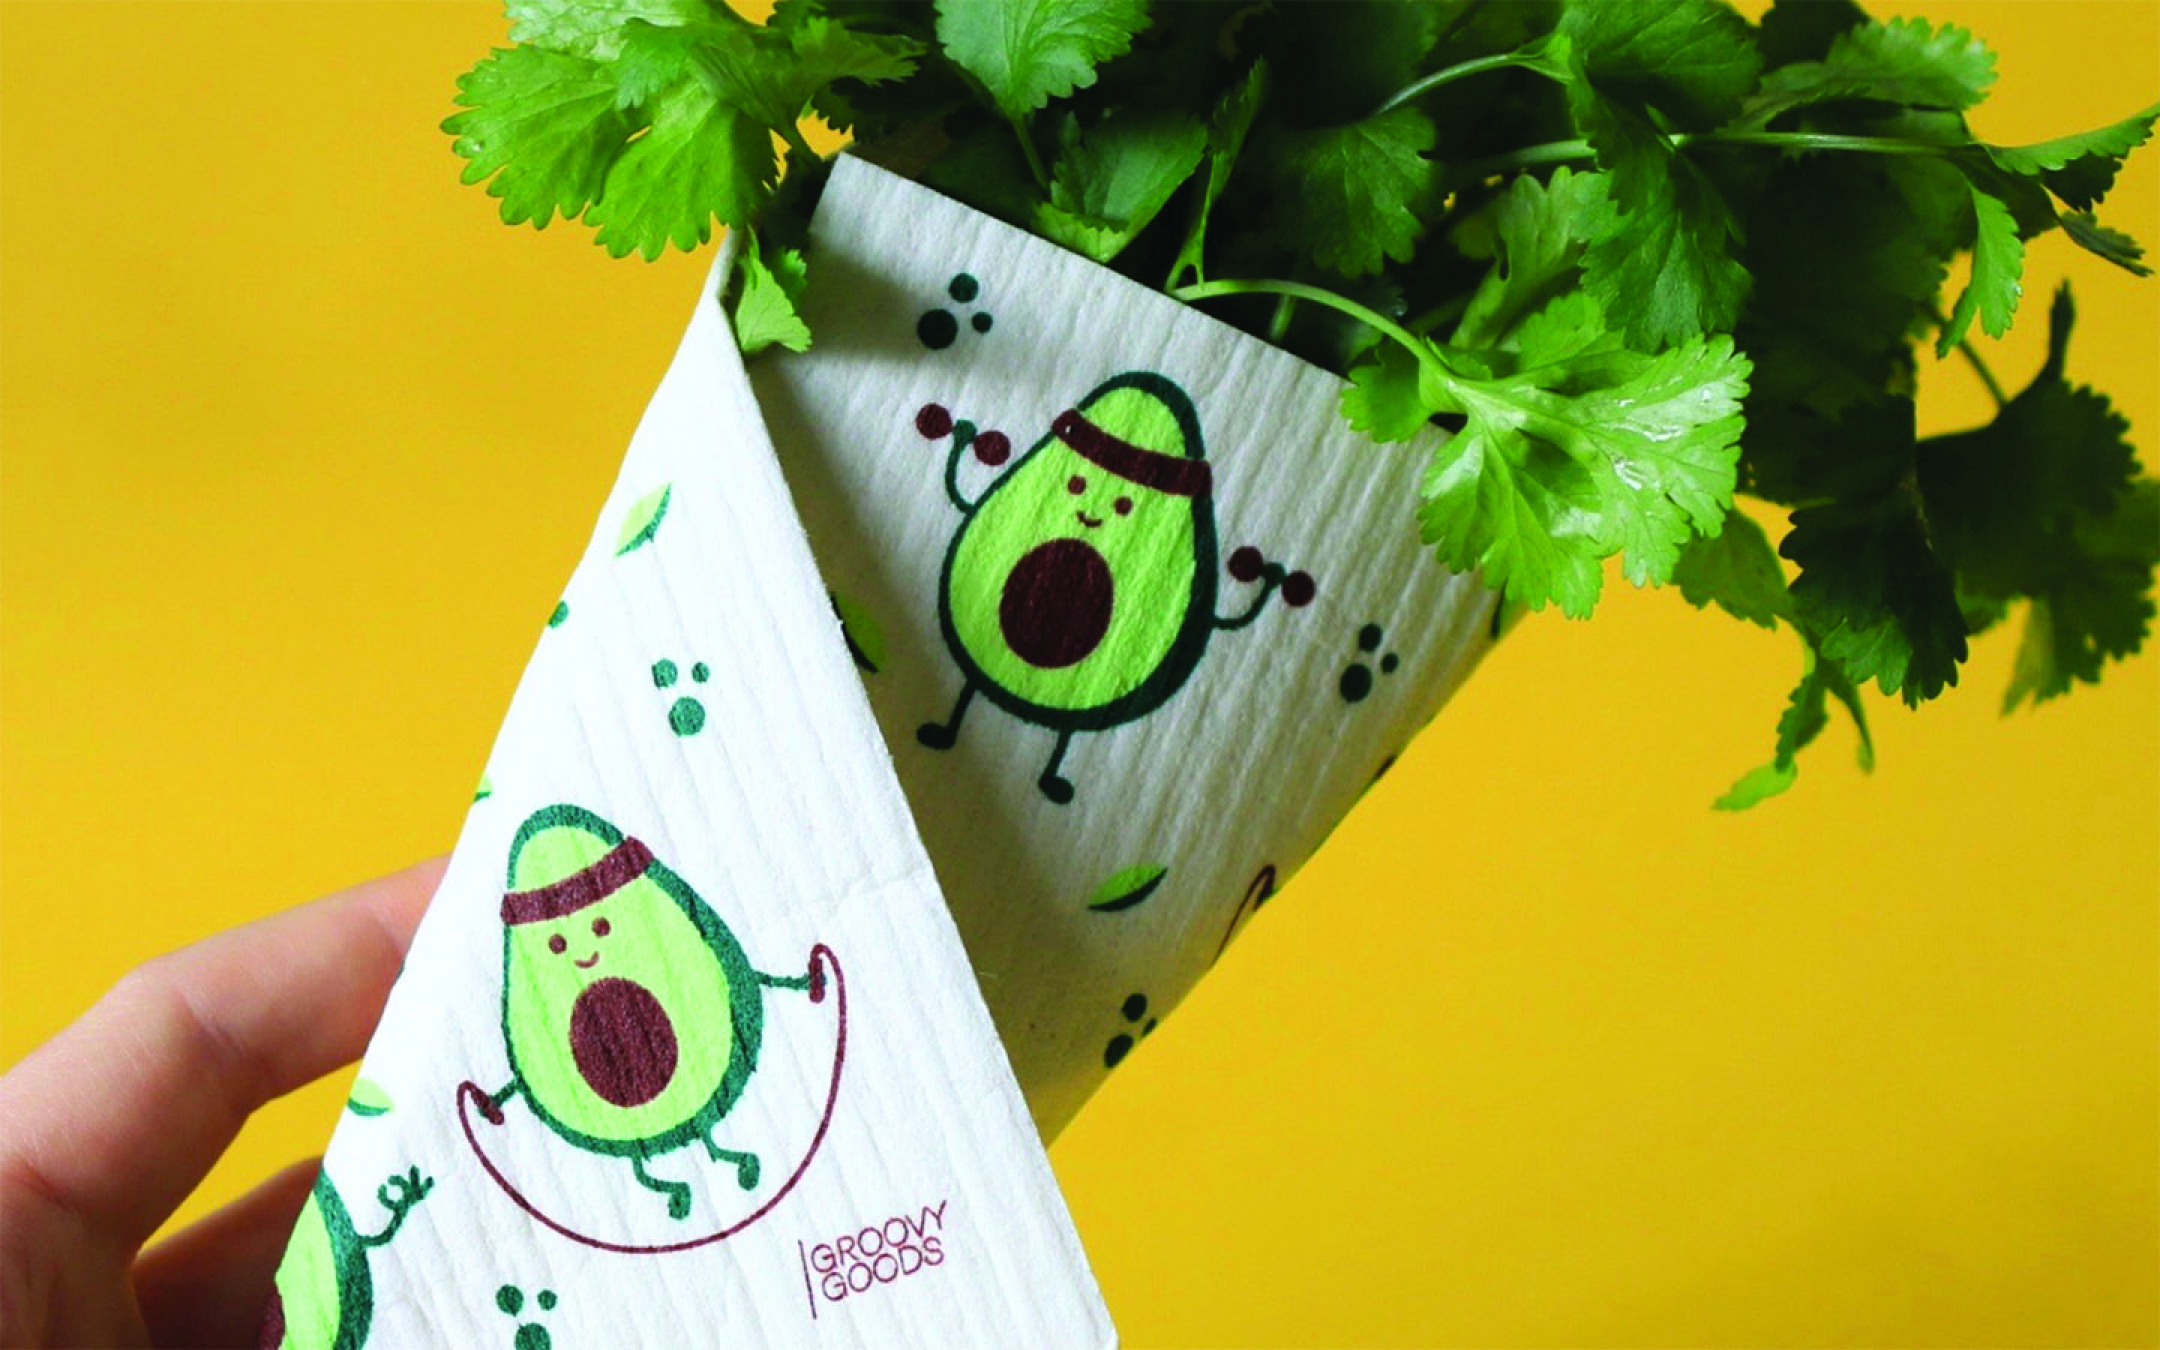 Ecological sponge cloth